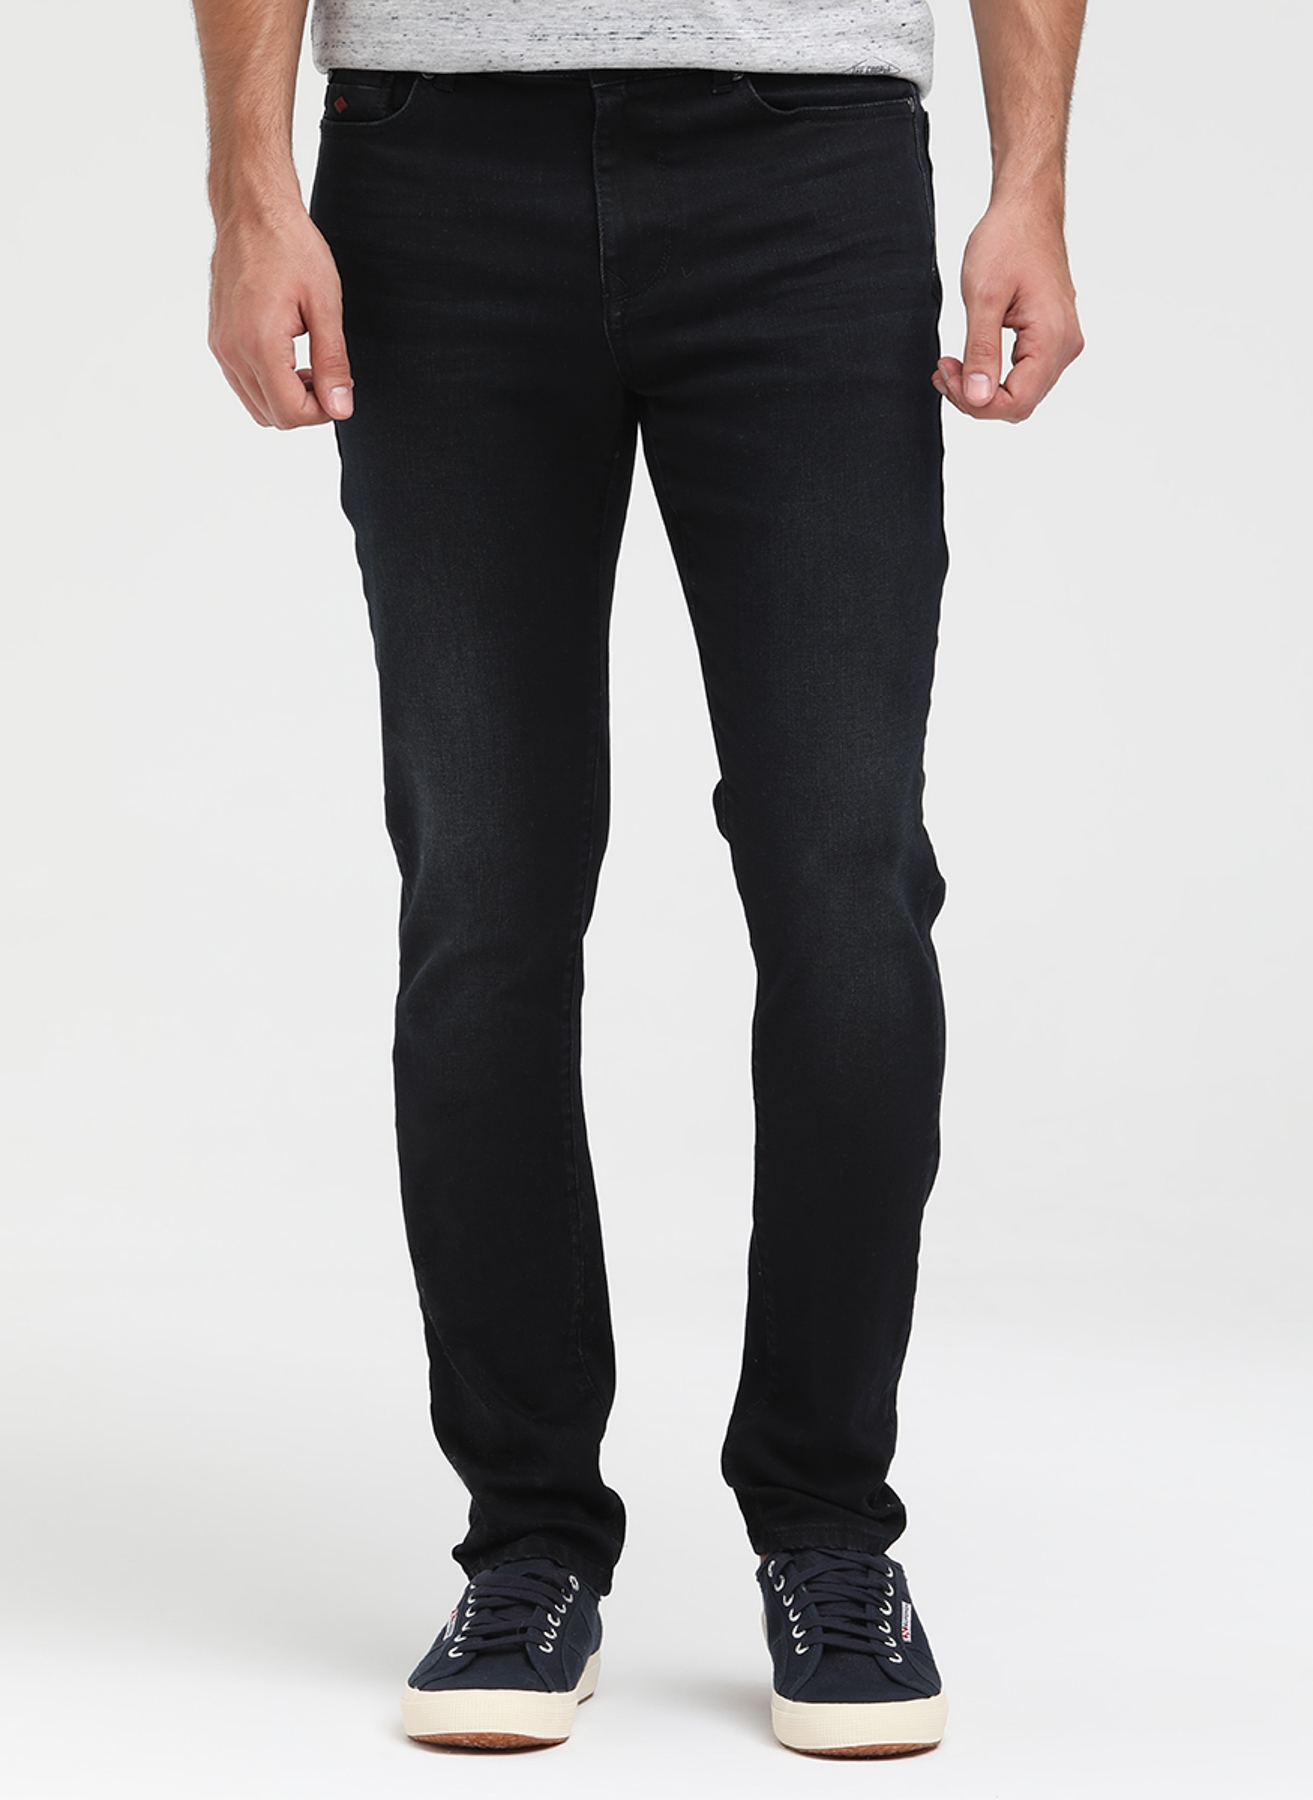 Lee Cooper Jeff Klasik Pantolon 30-31 5000200302005 Ürün Resmi